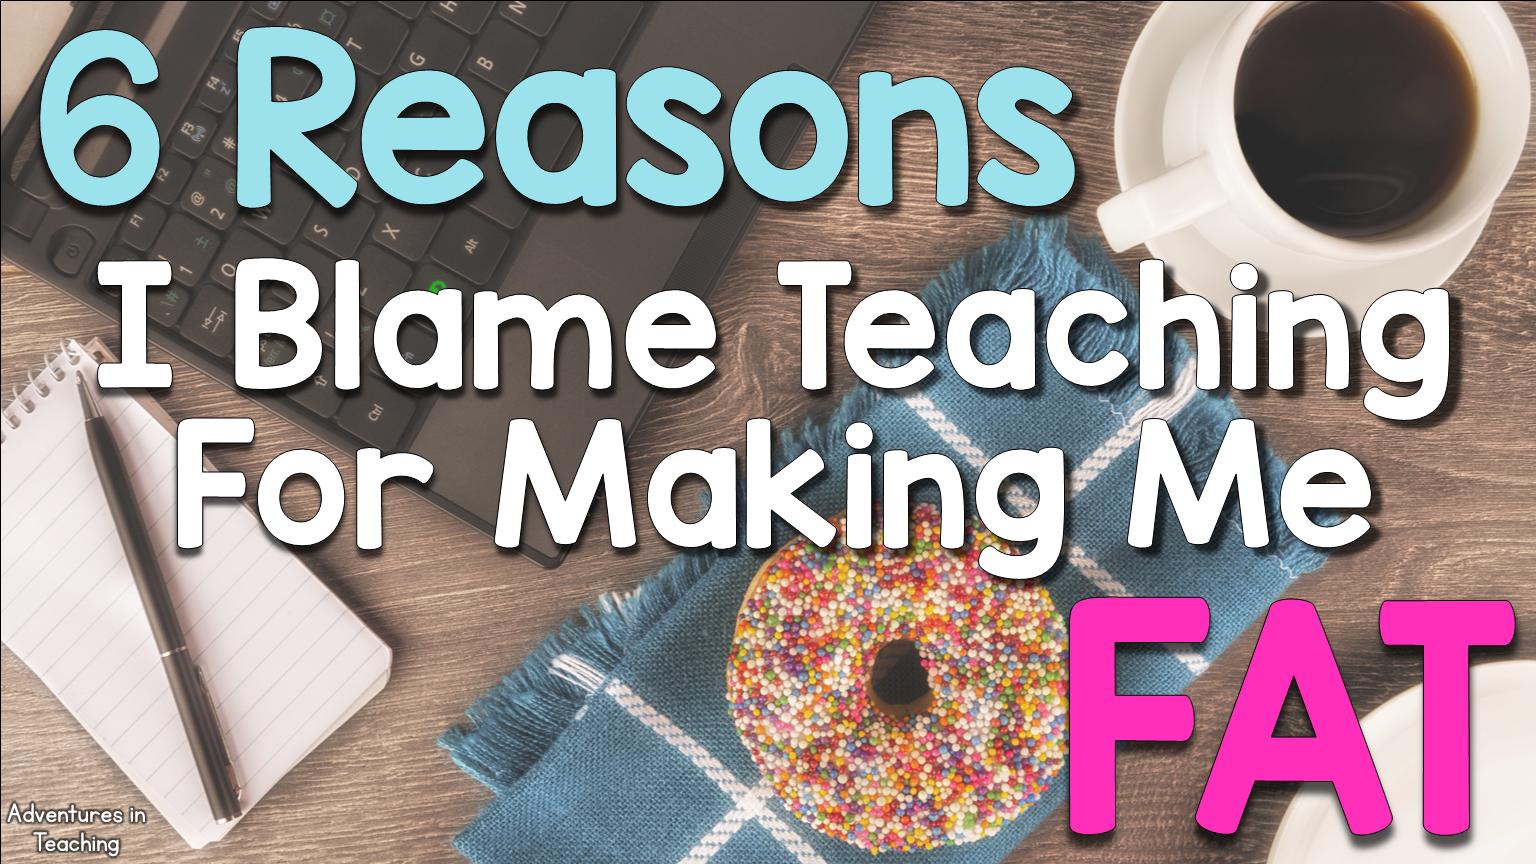 I Blame Teaching